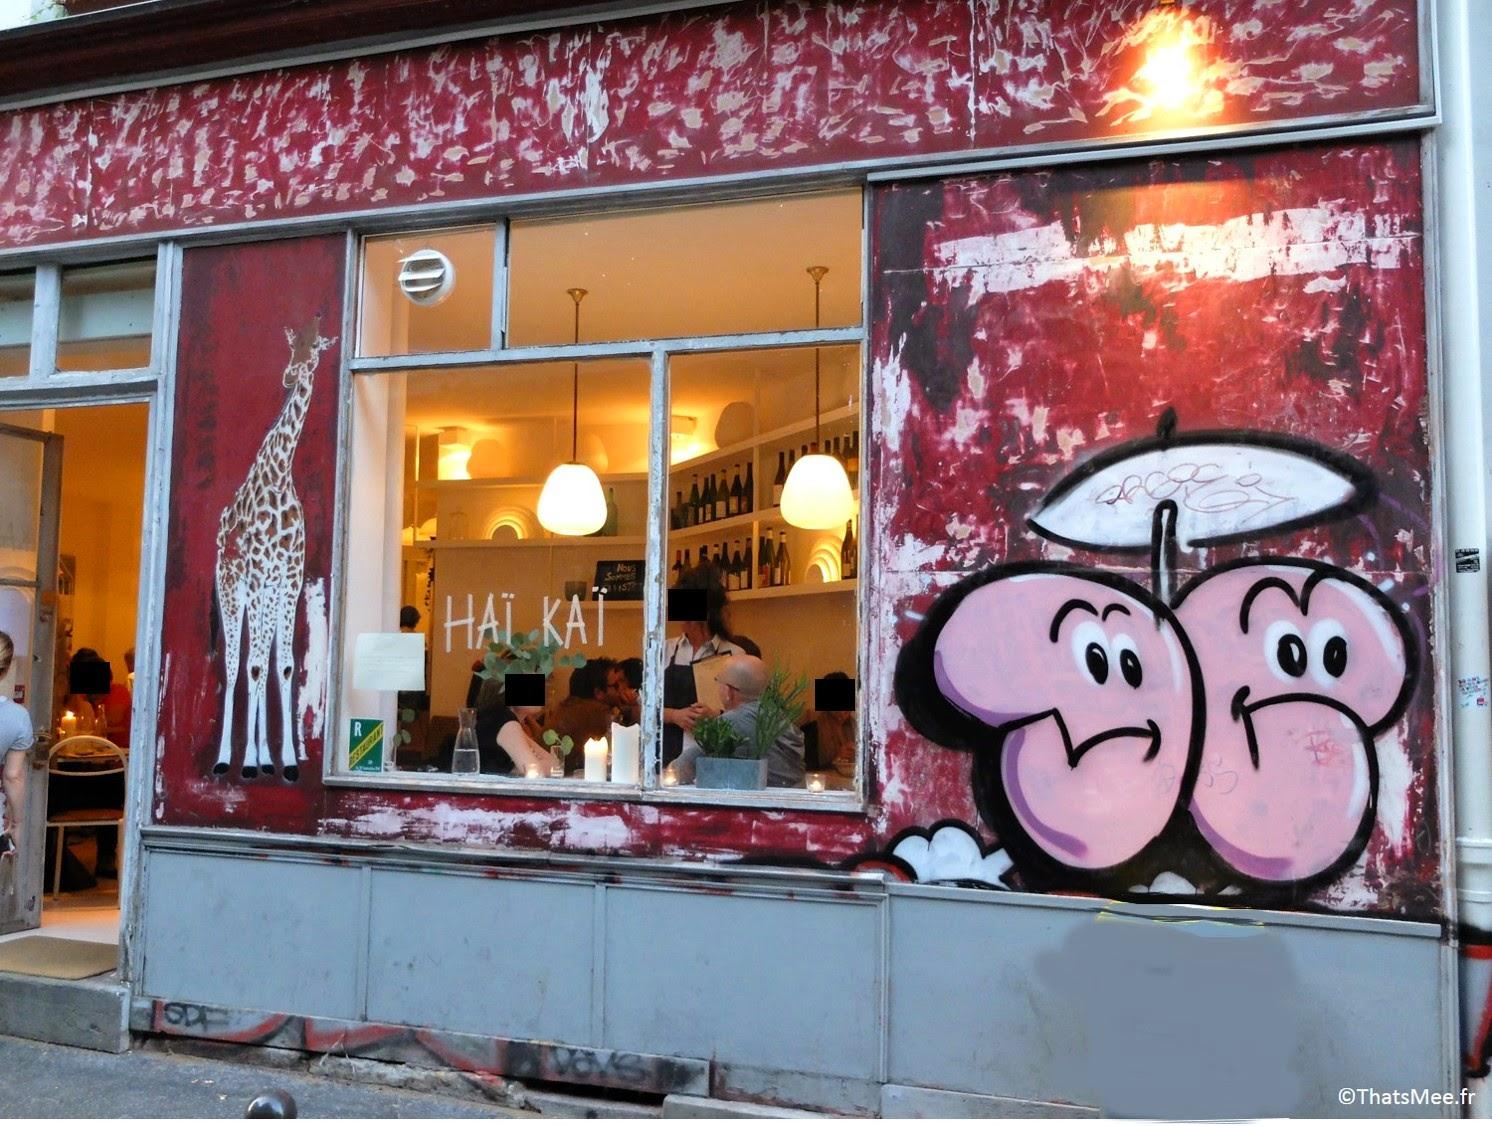 Déco fresque mur tag graffiti girafe Restaurant Haï Kai Paris, menu food du marché caviste cave à vins bio resto Haï Kai quai de Jemmapes Paris 10ème canal Saint-Martin